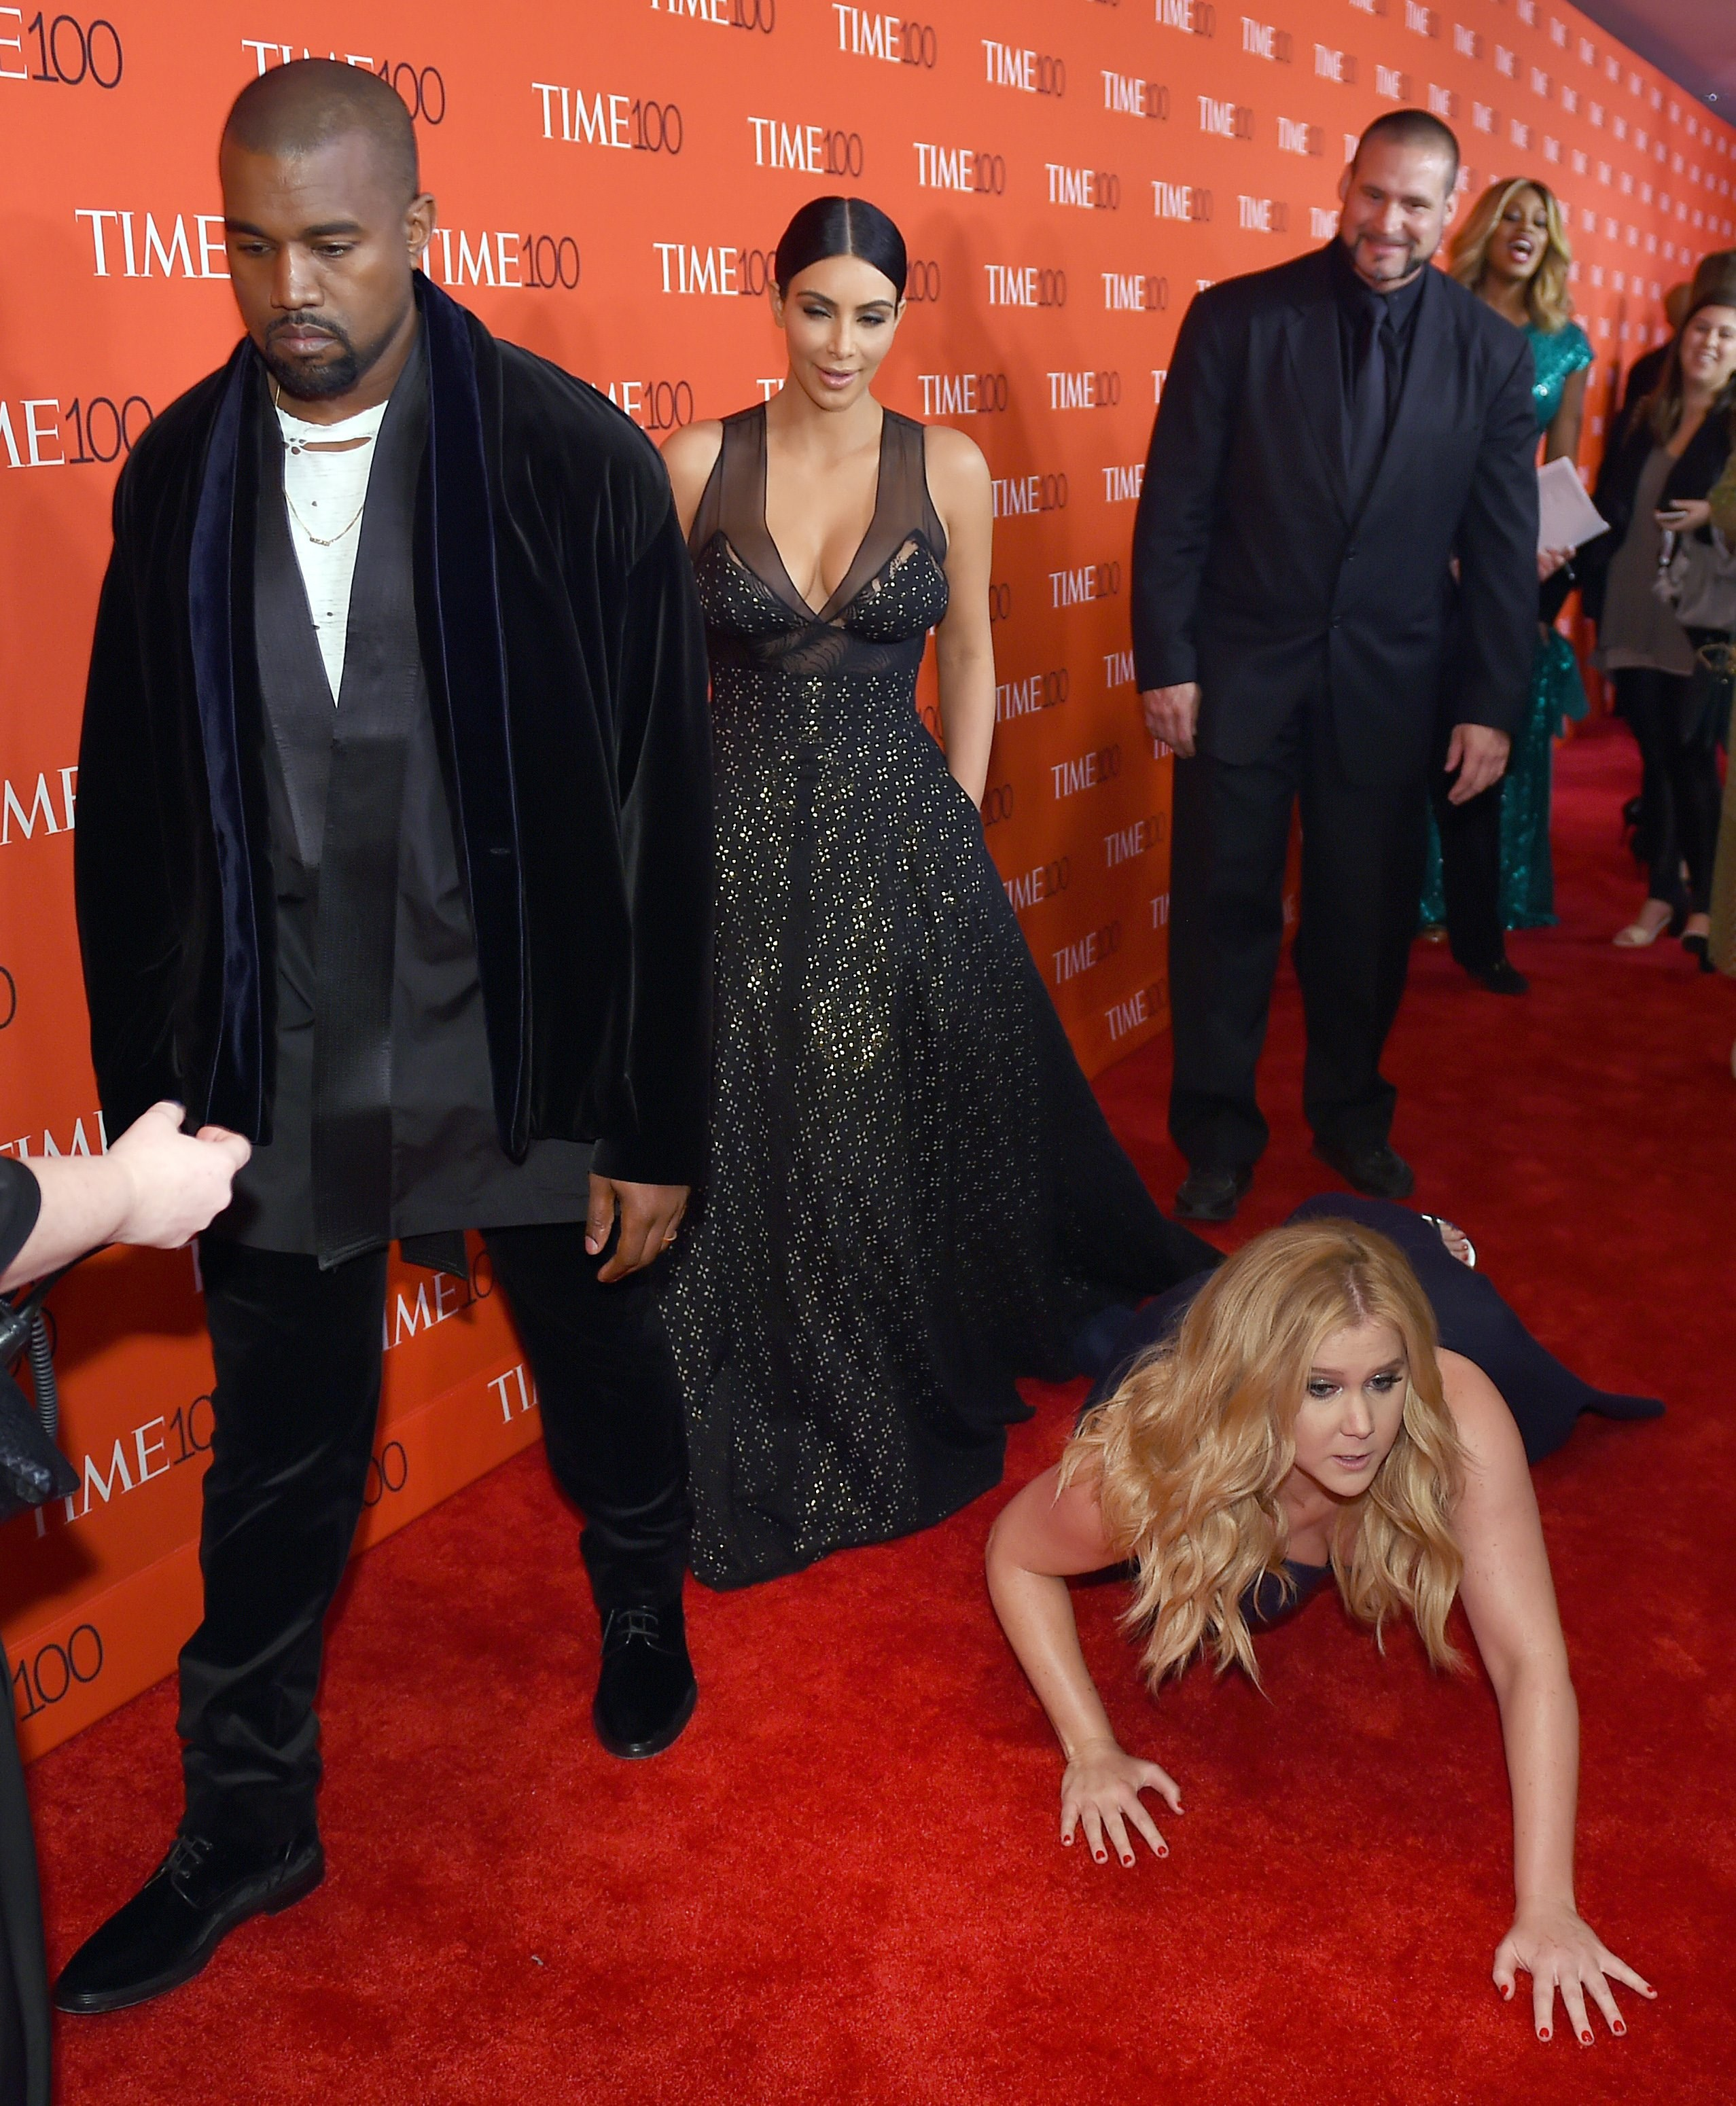 Kanye West Kim Kardashian Amy Schumer Prank